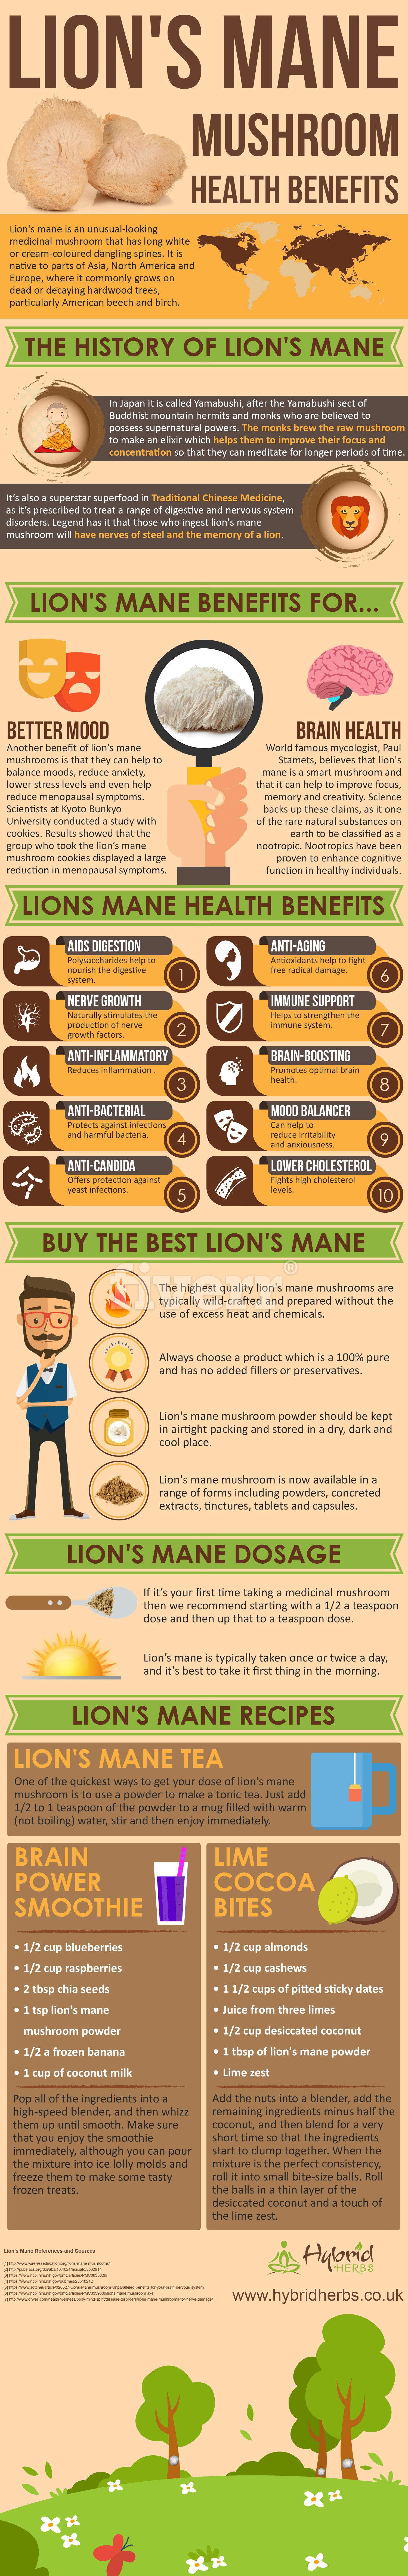 lions-mane-mushroom-health-benefits.jpg